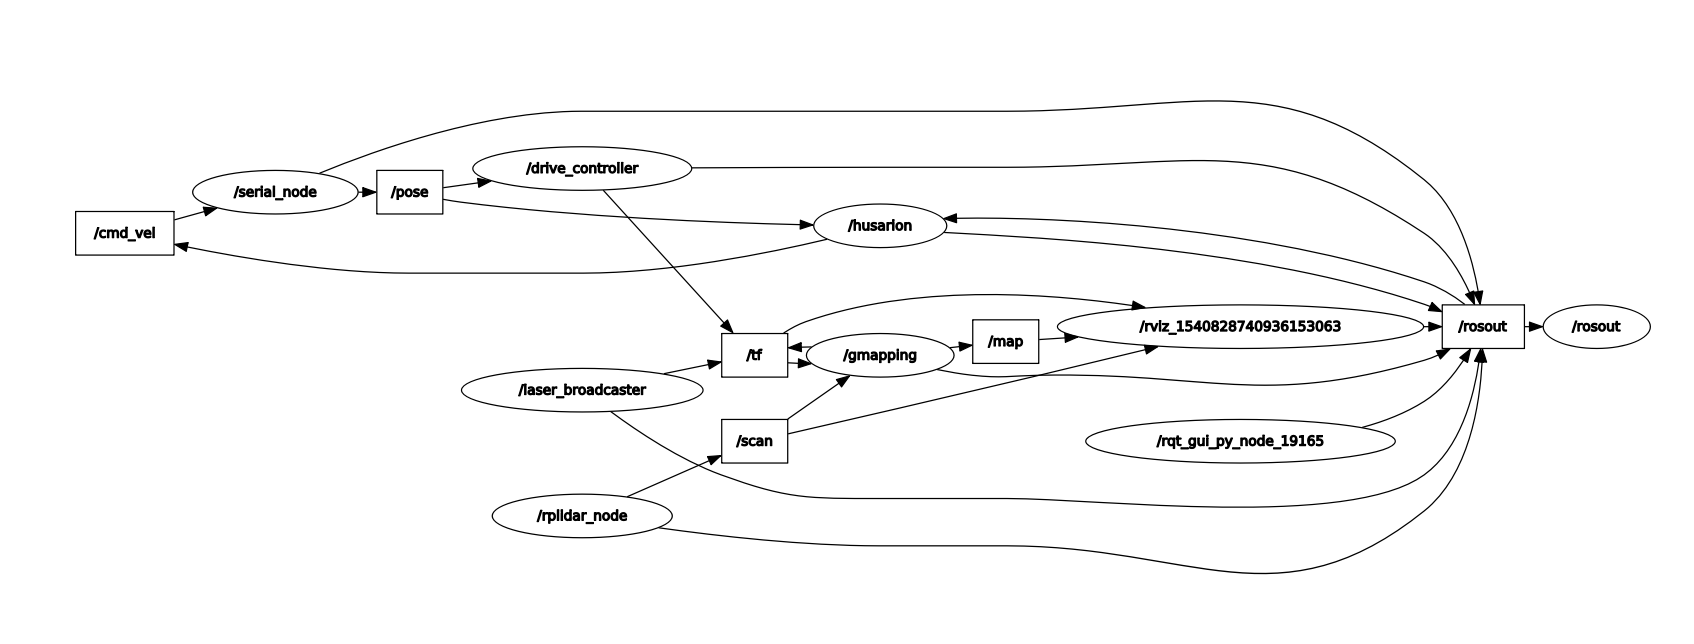 SLAM navigation tutorial - Software - Husarion Community